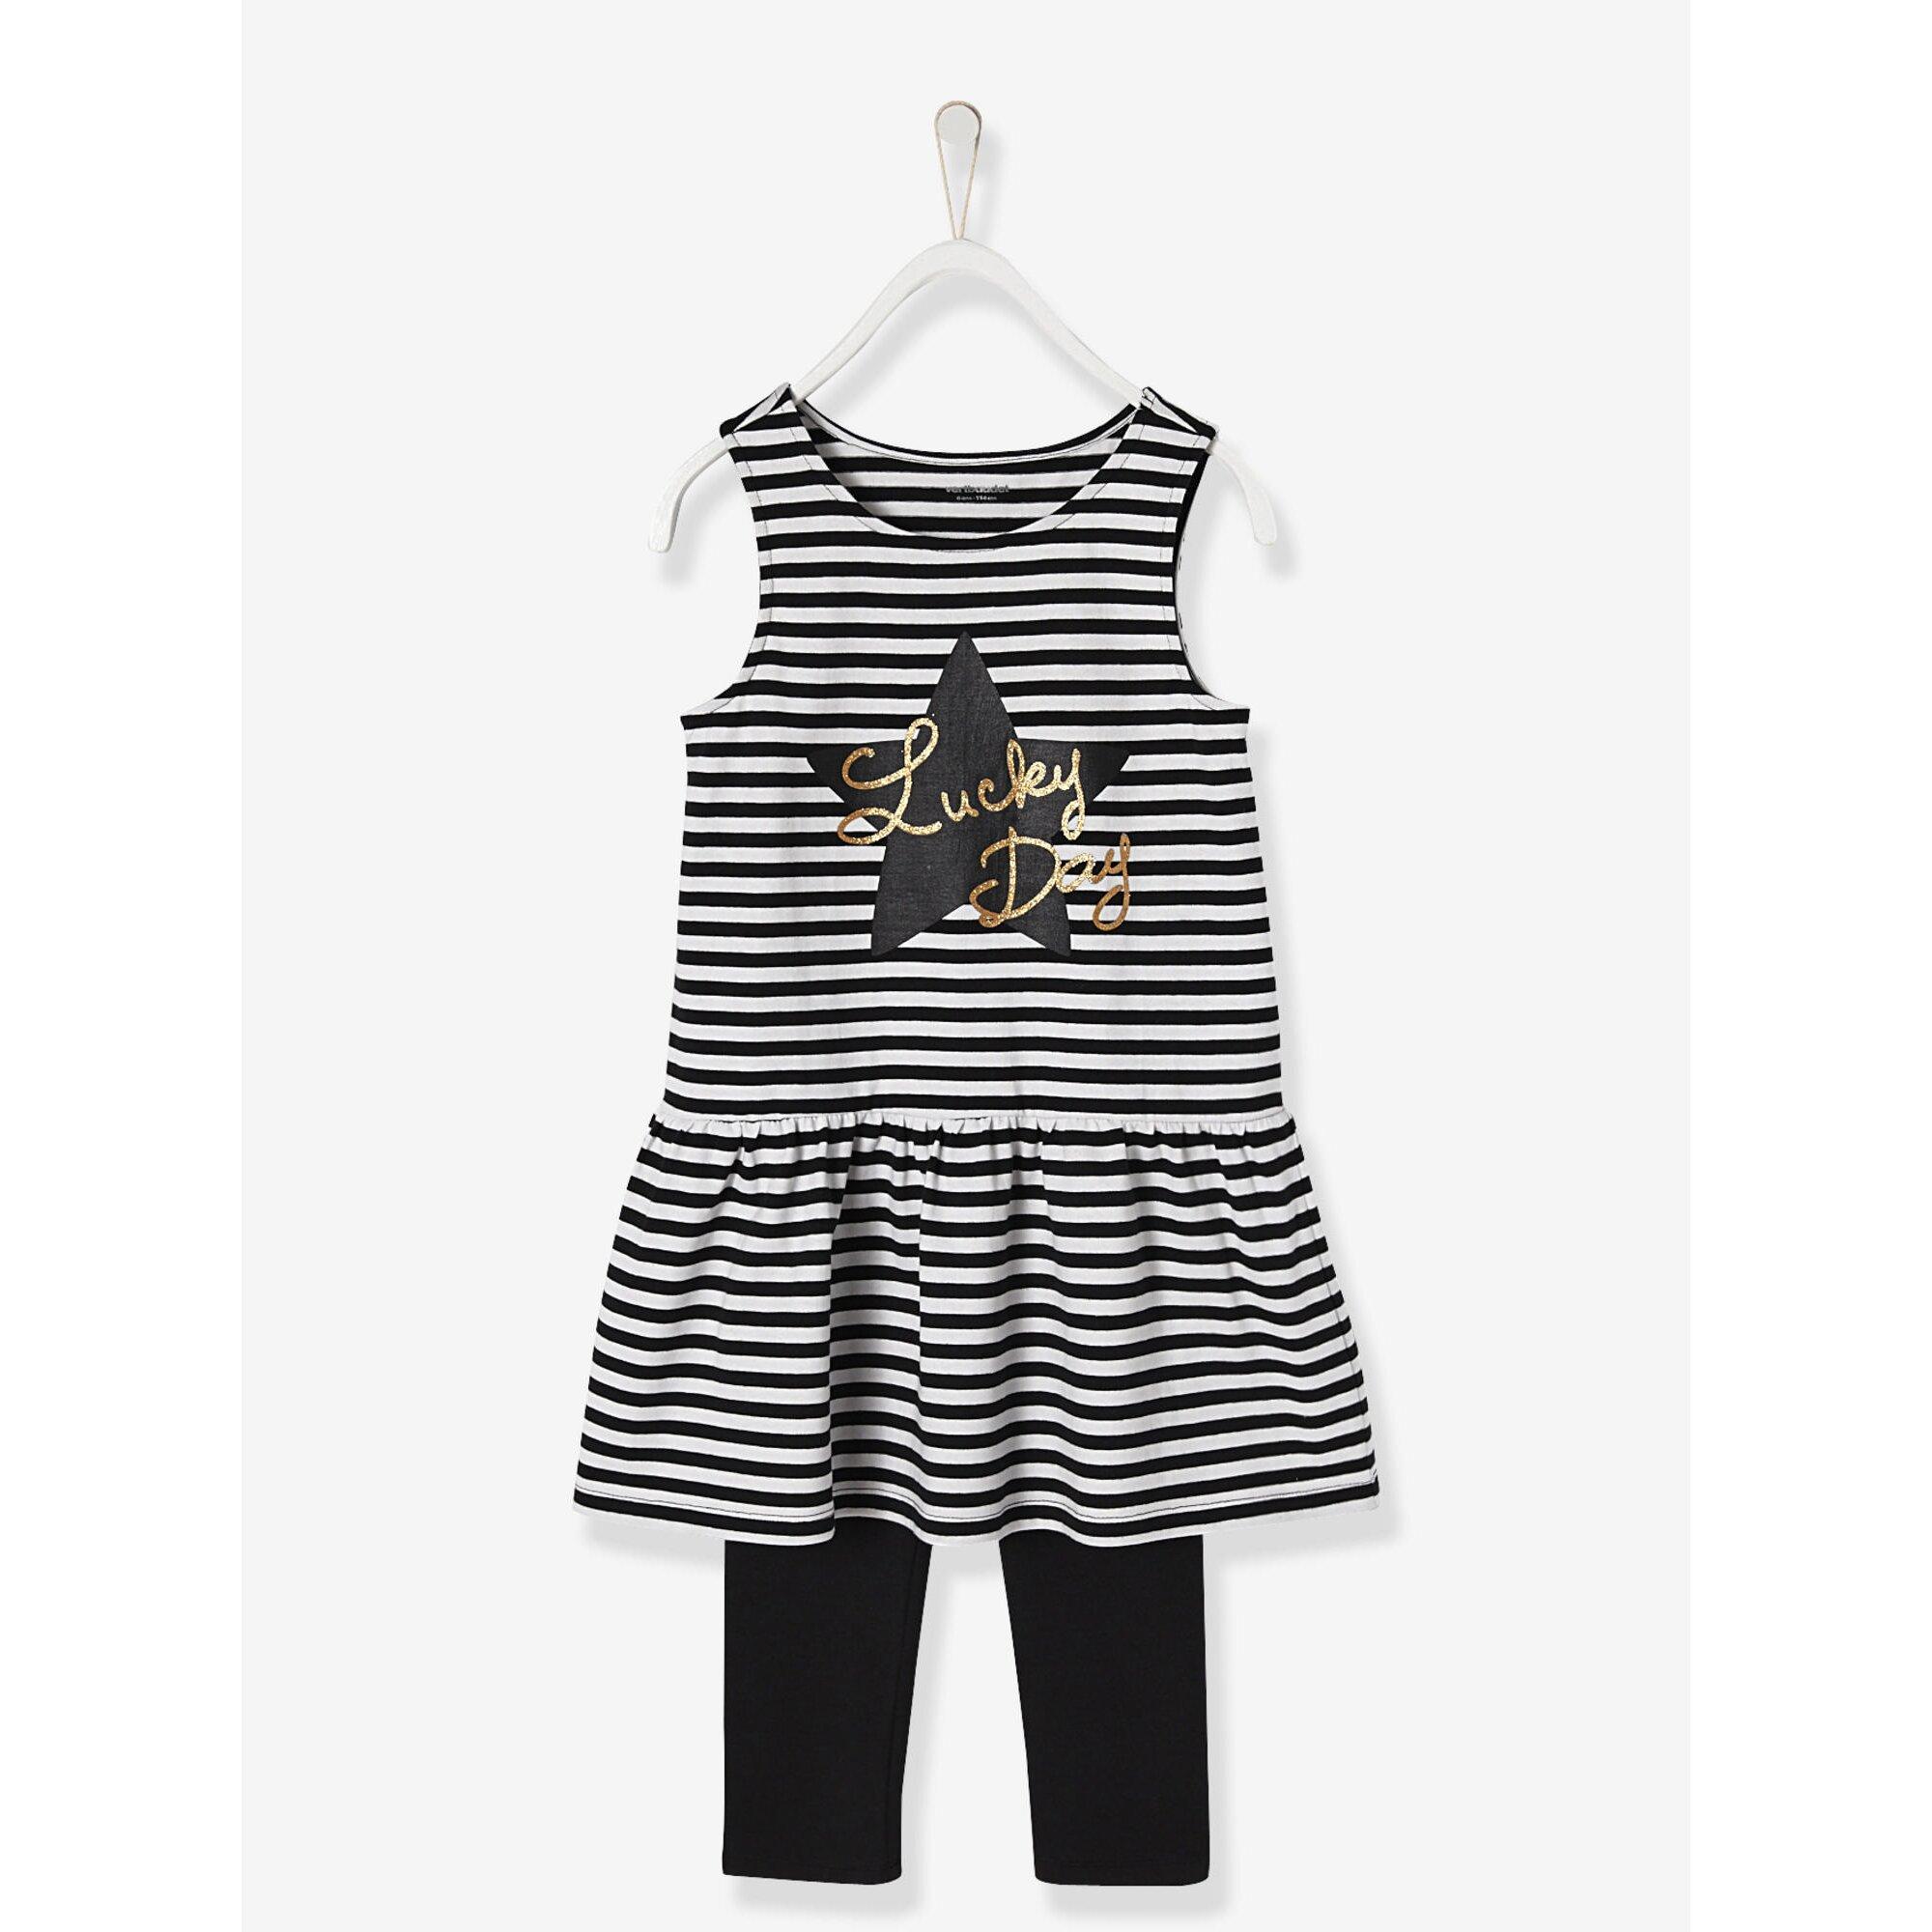 vertbaudet-madchenset-kleid-cardigan-leggings, 30.99 EUR @ babywalz-de